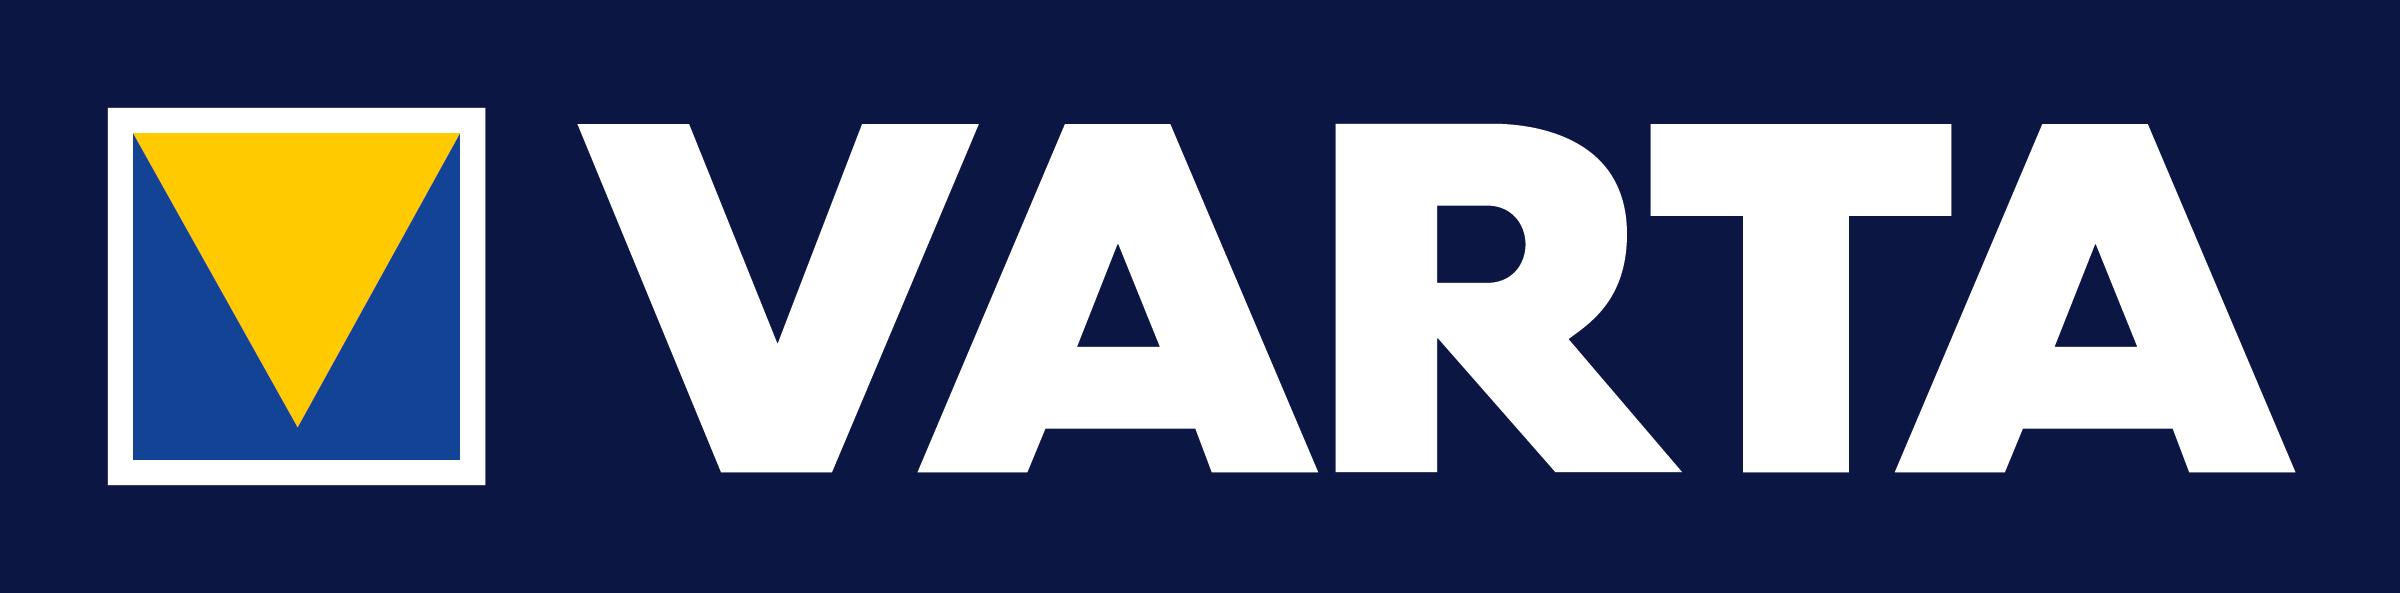 VARTA Consumer Batteries GmbH & Co. KGaA